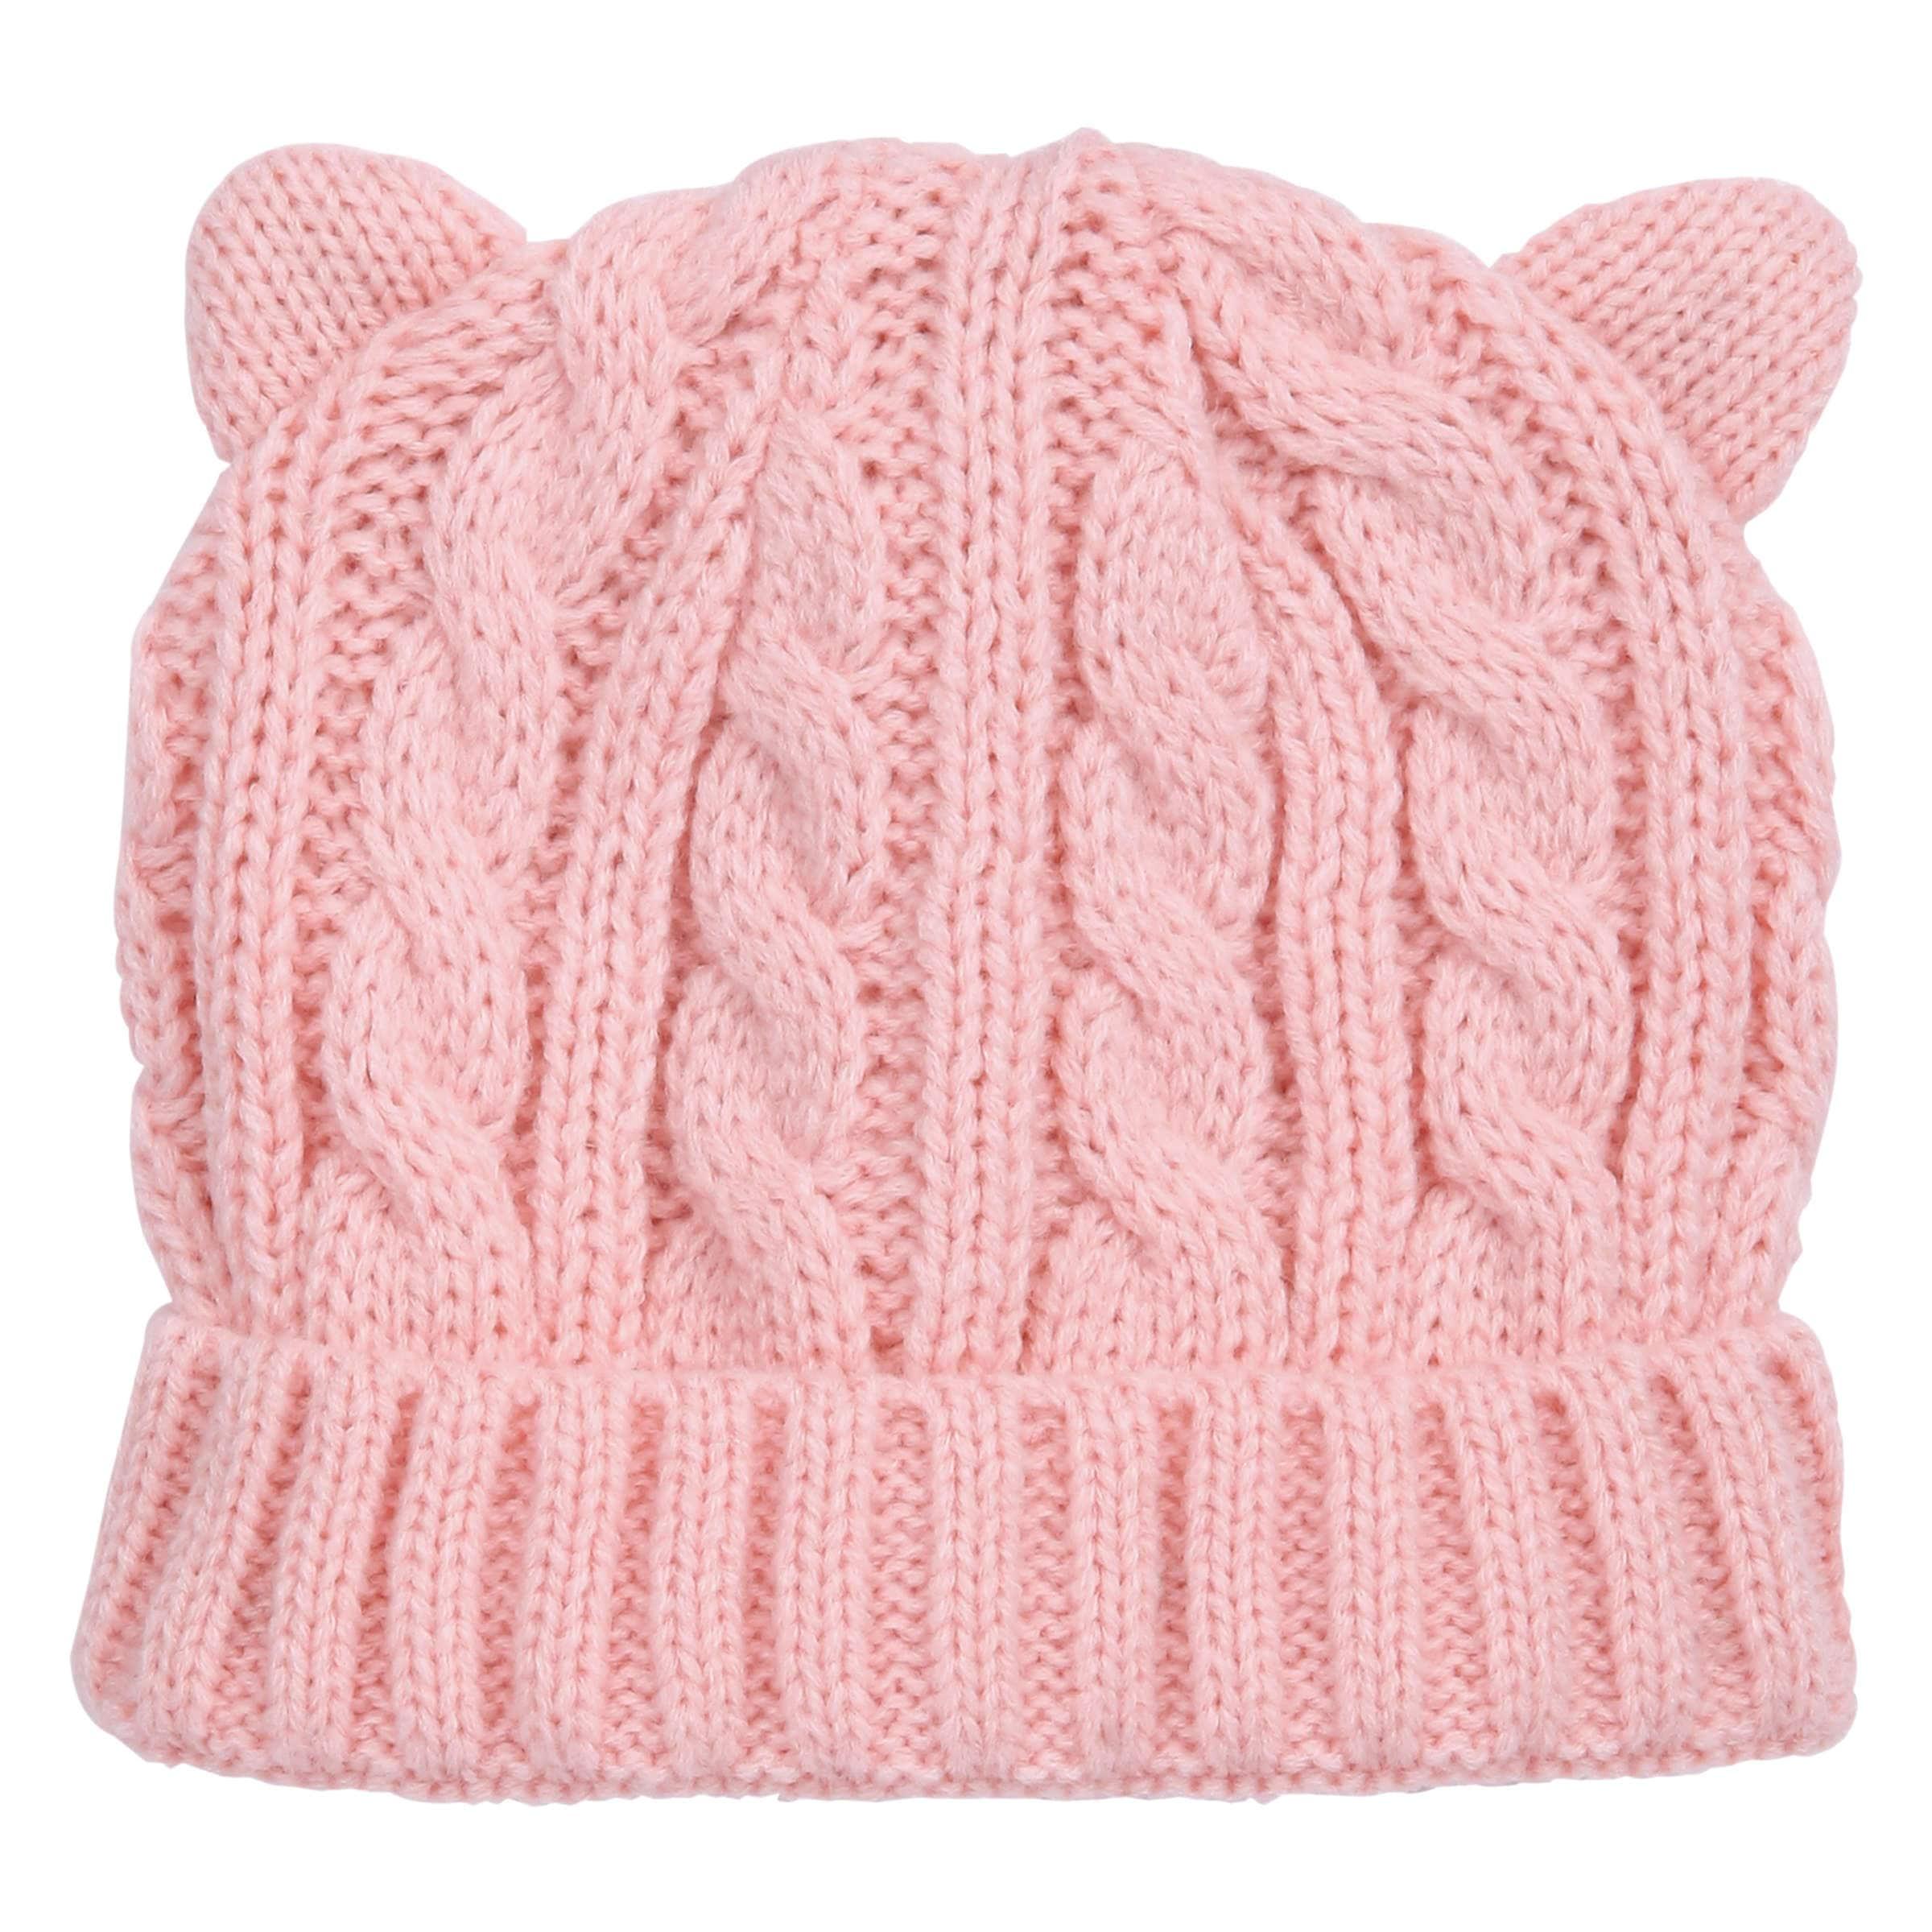 b1390d946ae Baby Girls  Animal Ear Hat in JF Perennial Pink from Joe Fresh